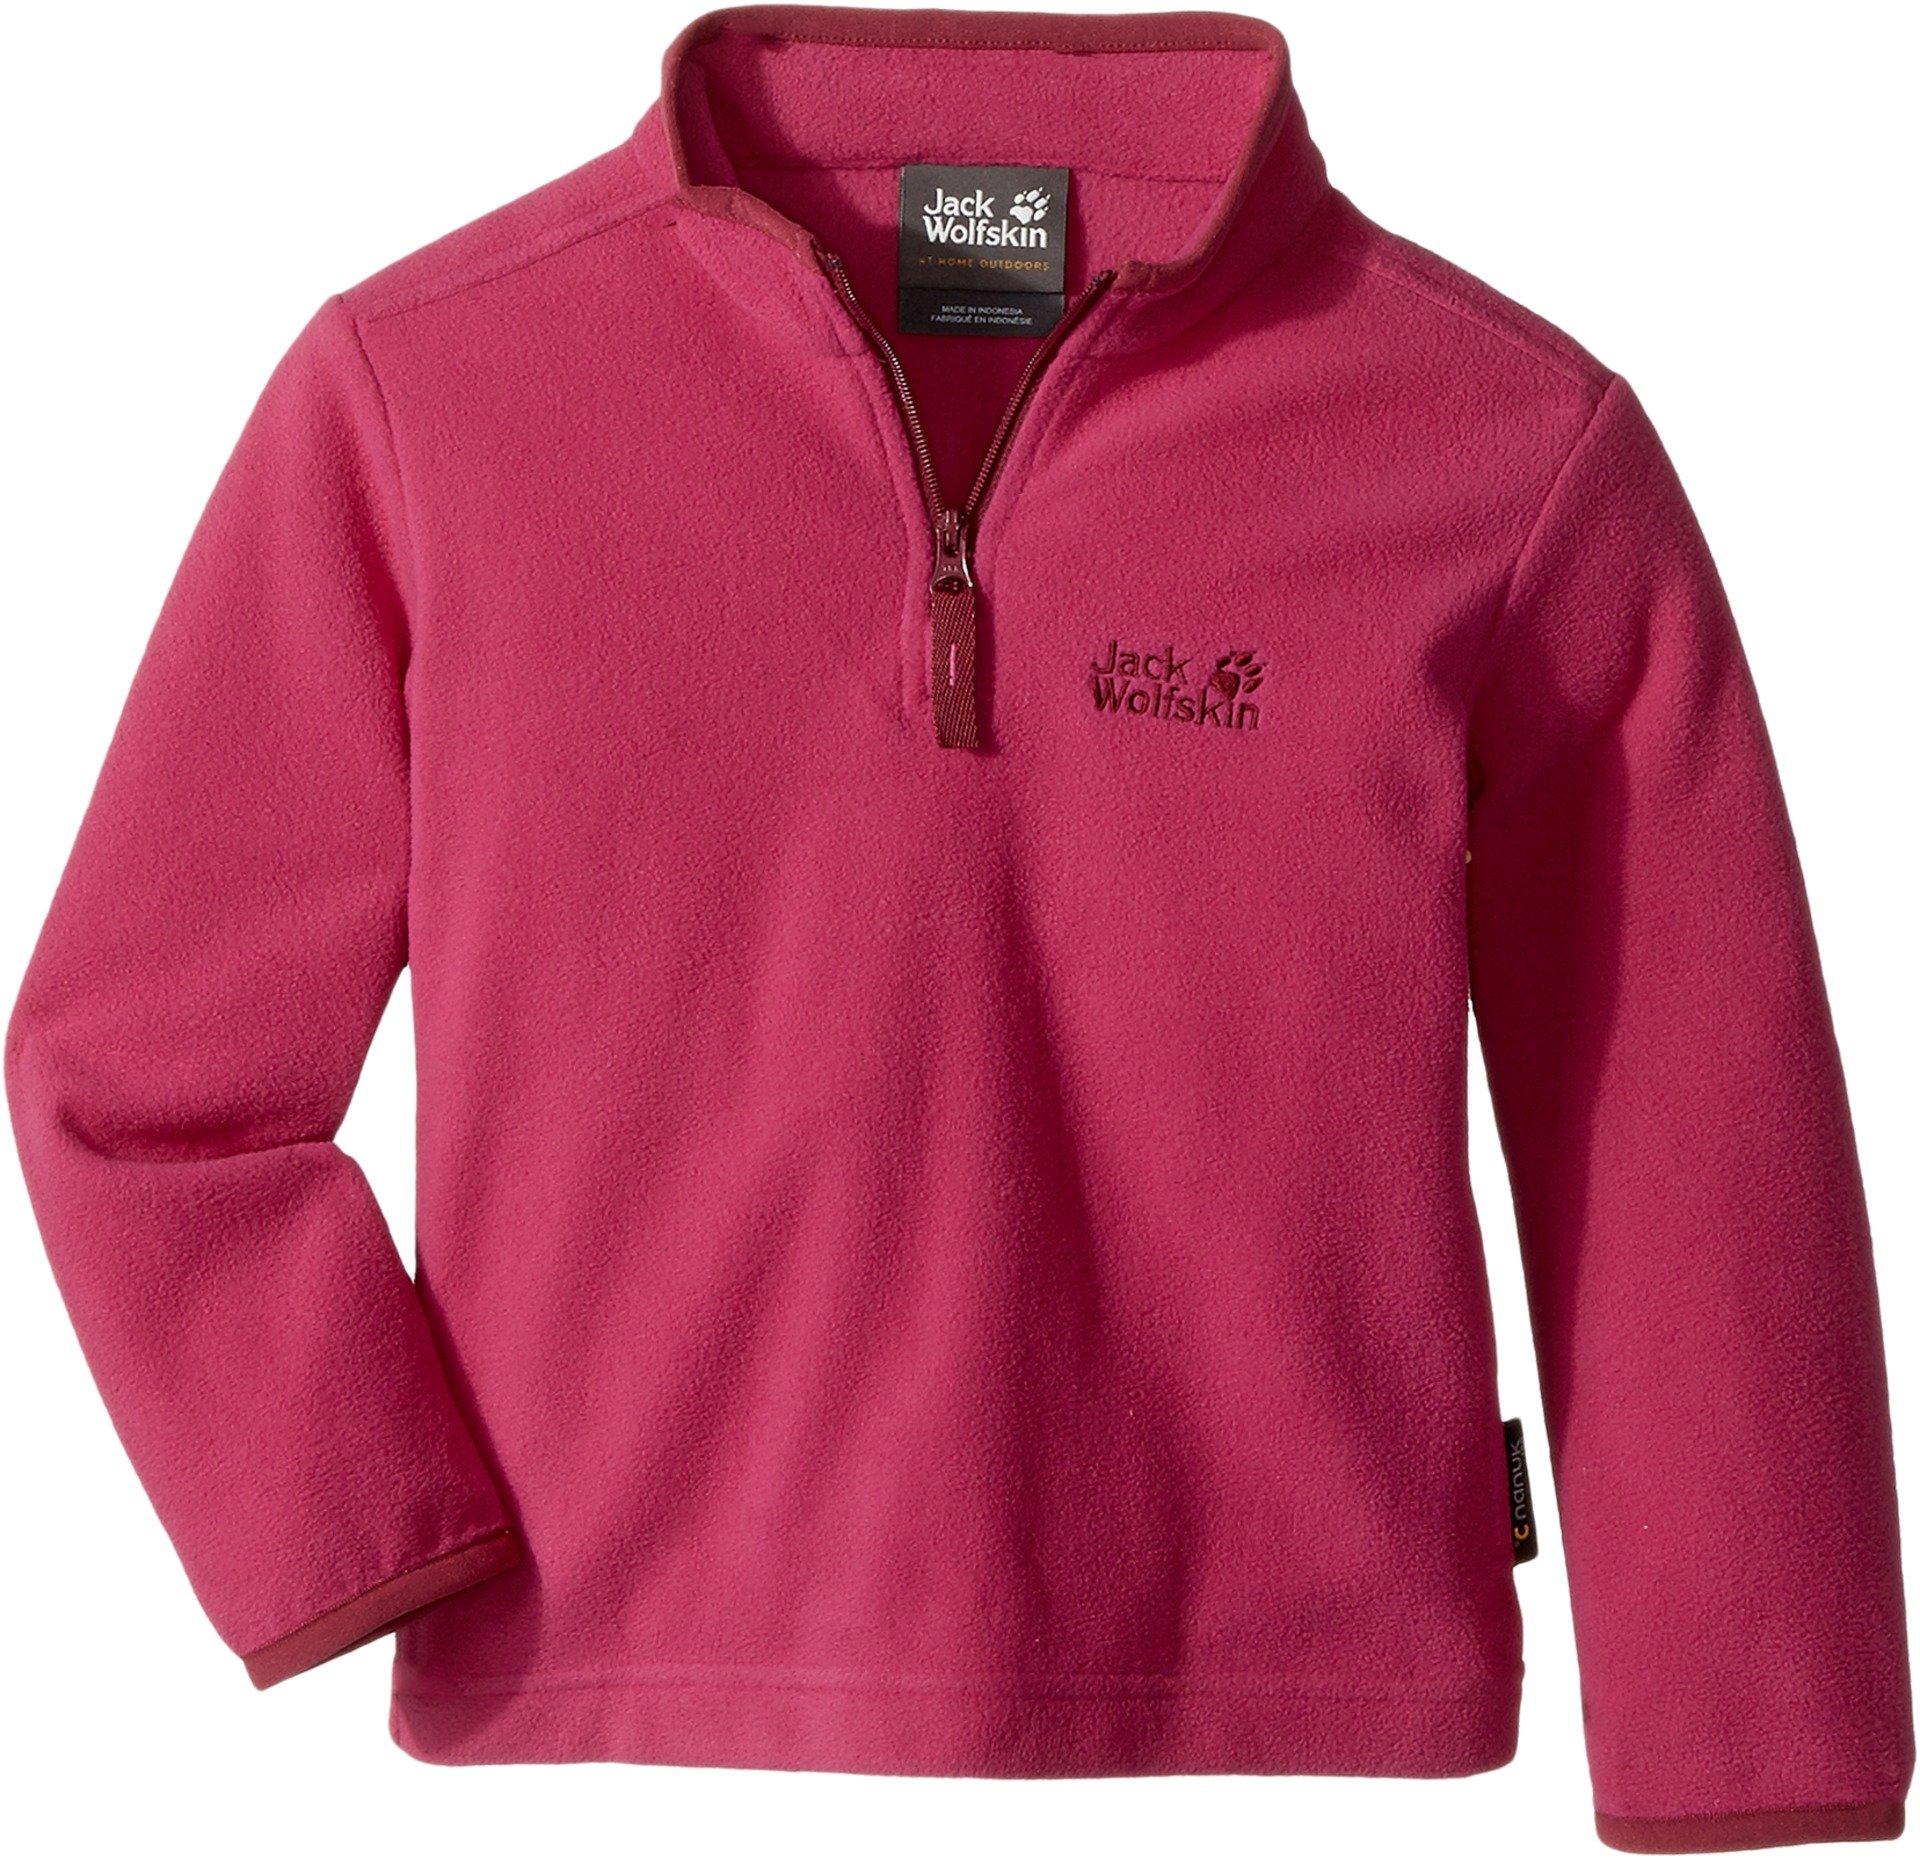 Jack Wolfskin K Wolf Pullover Sweater, Fuchsia, Size 164 (13-14 Years) by Jack Wolfskin